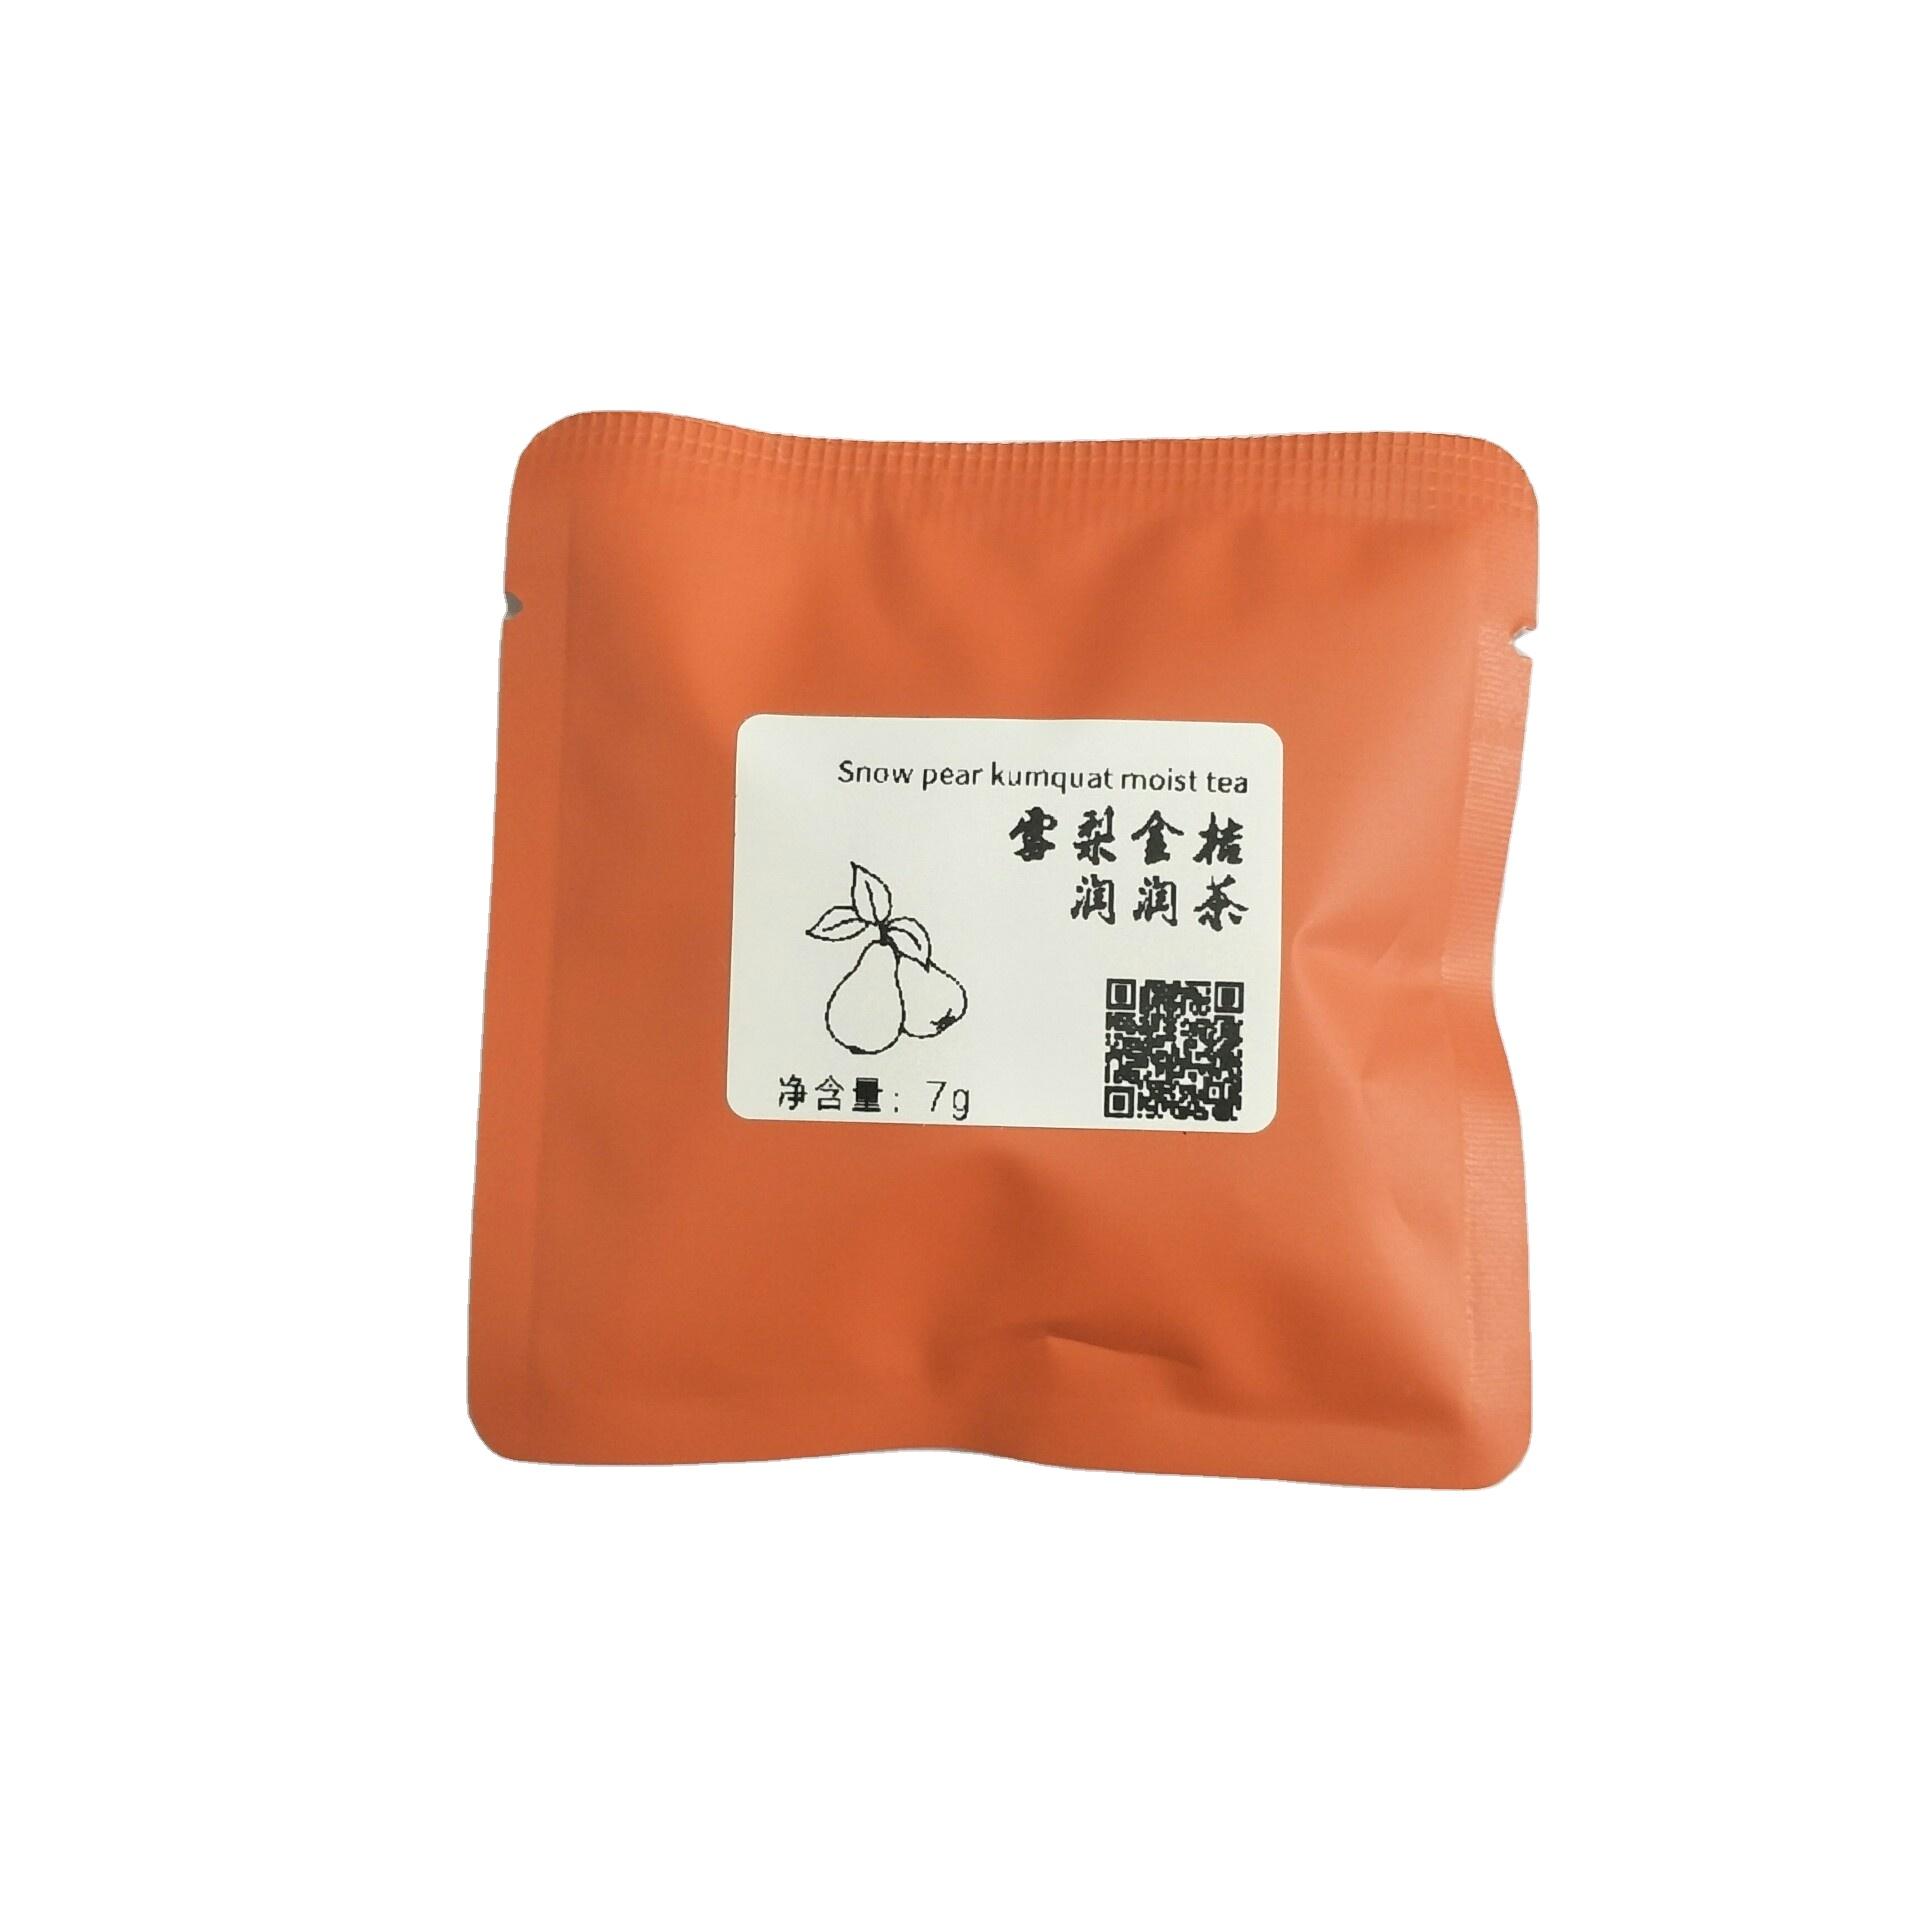 Organic Best Selling Chinese Herbal Detox Snow Pear Kumquat Moist High Quality Women's Fruit Flower Tea - 4uTea   4uTea.com